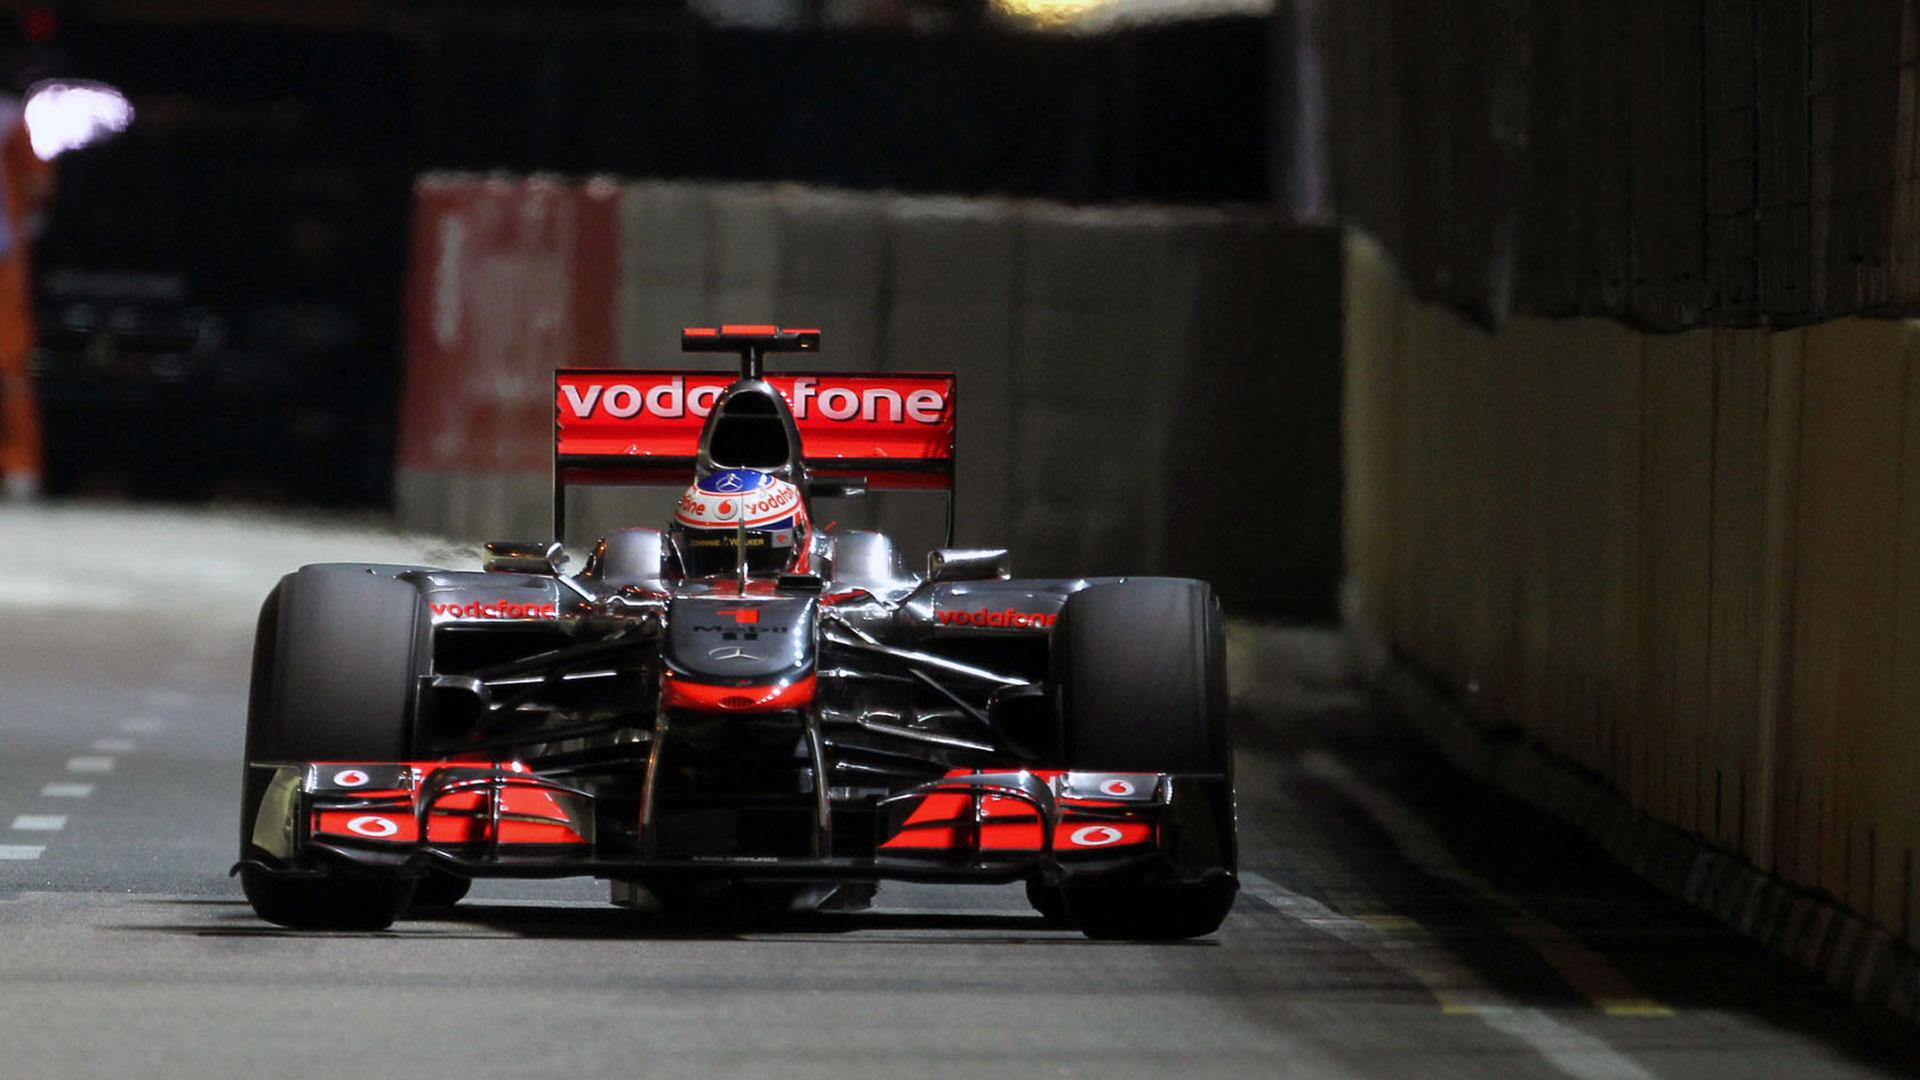 F1 Grand Prix 4